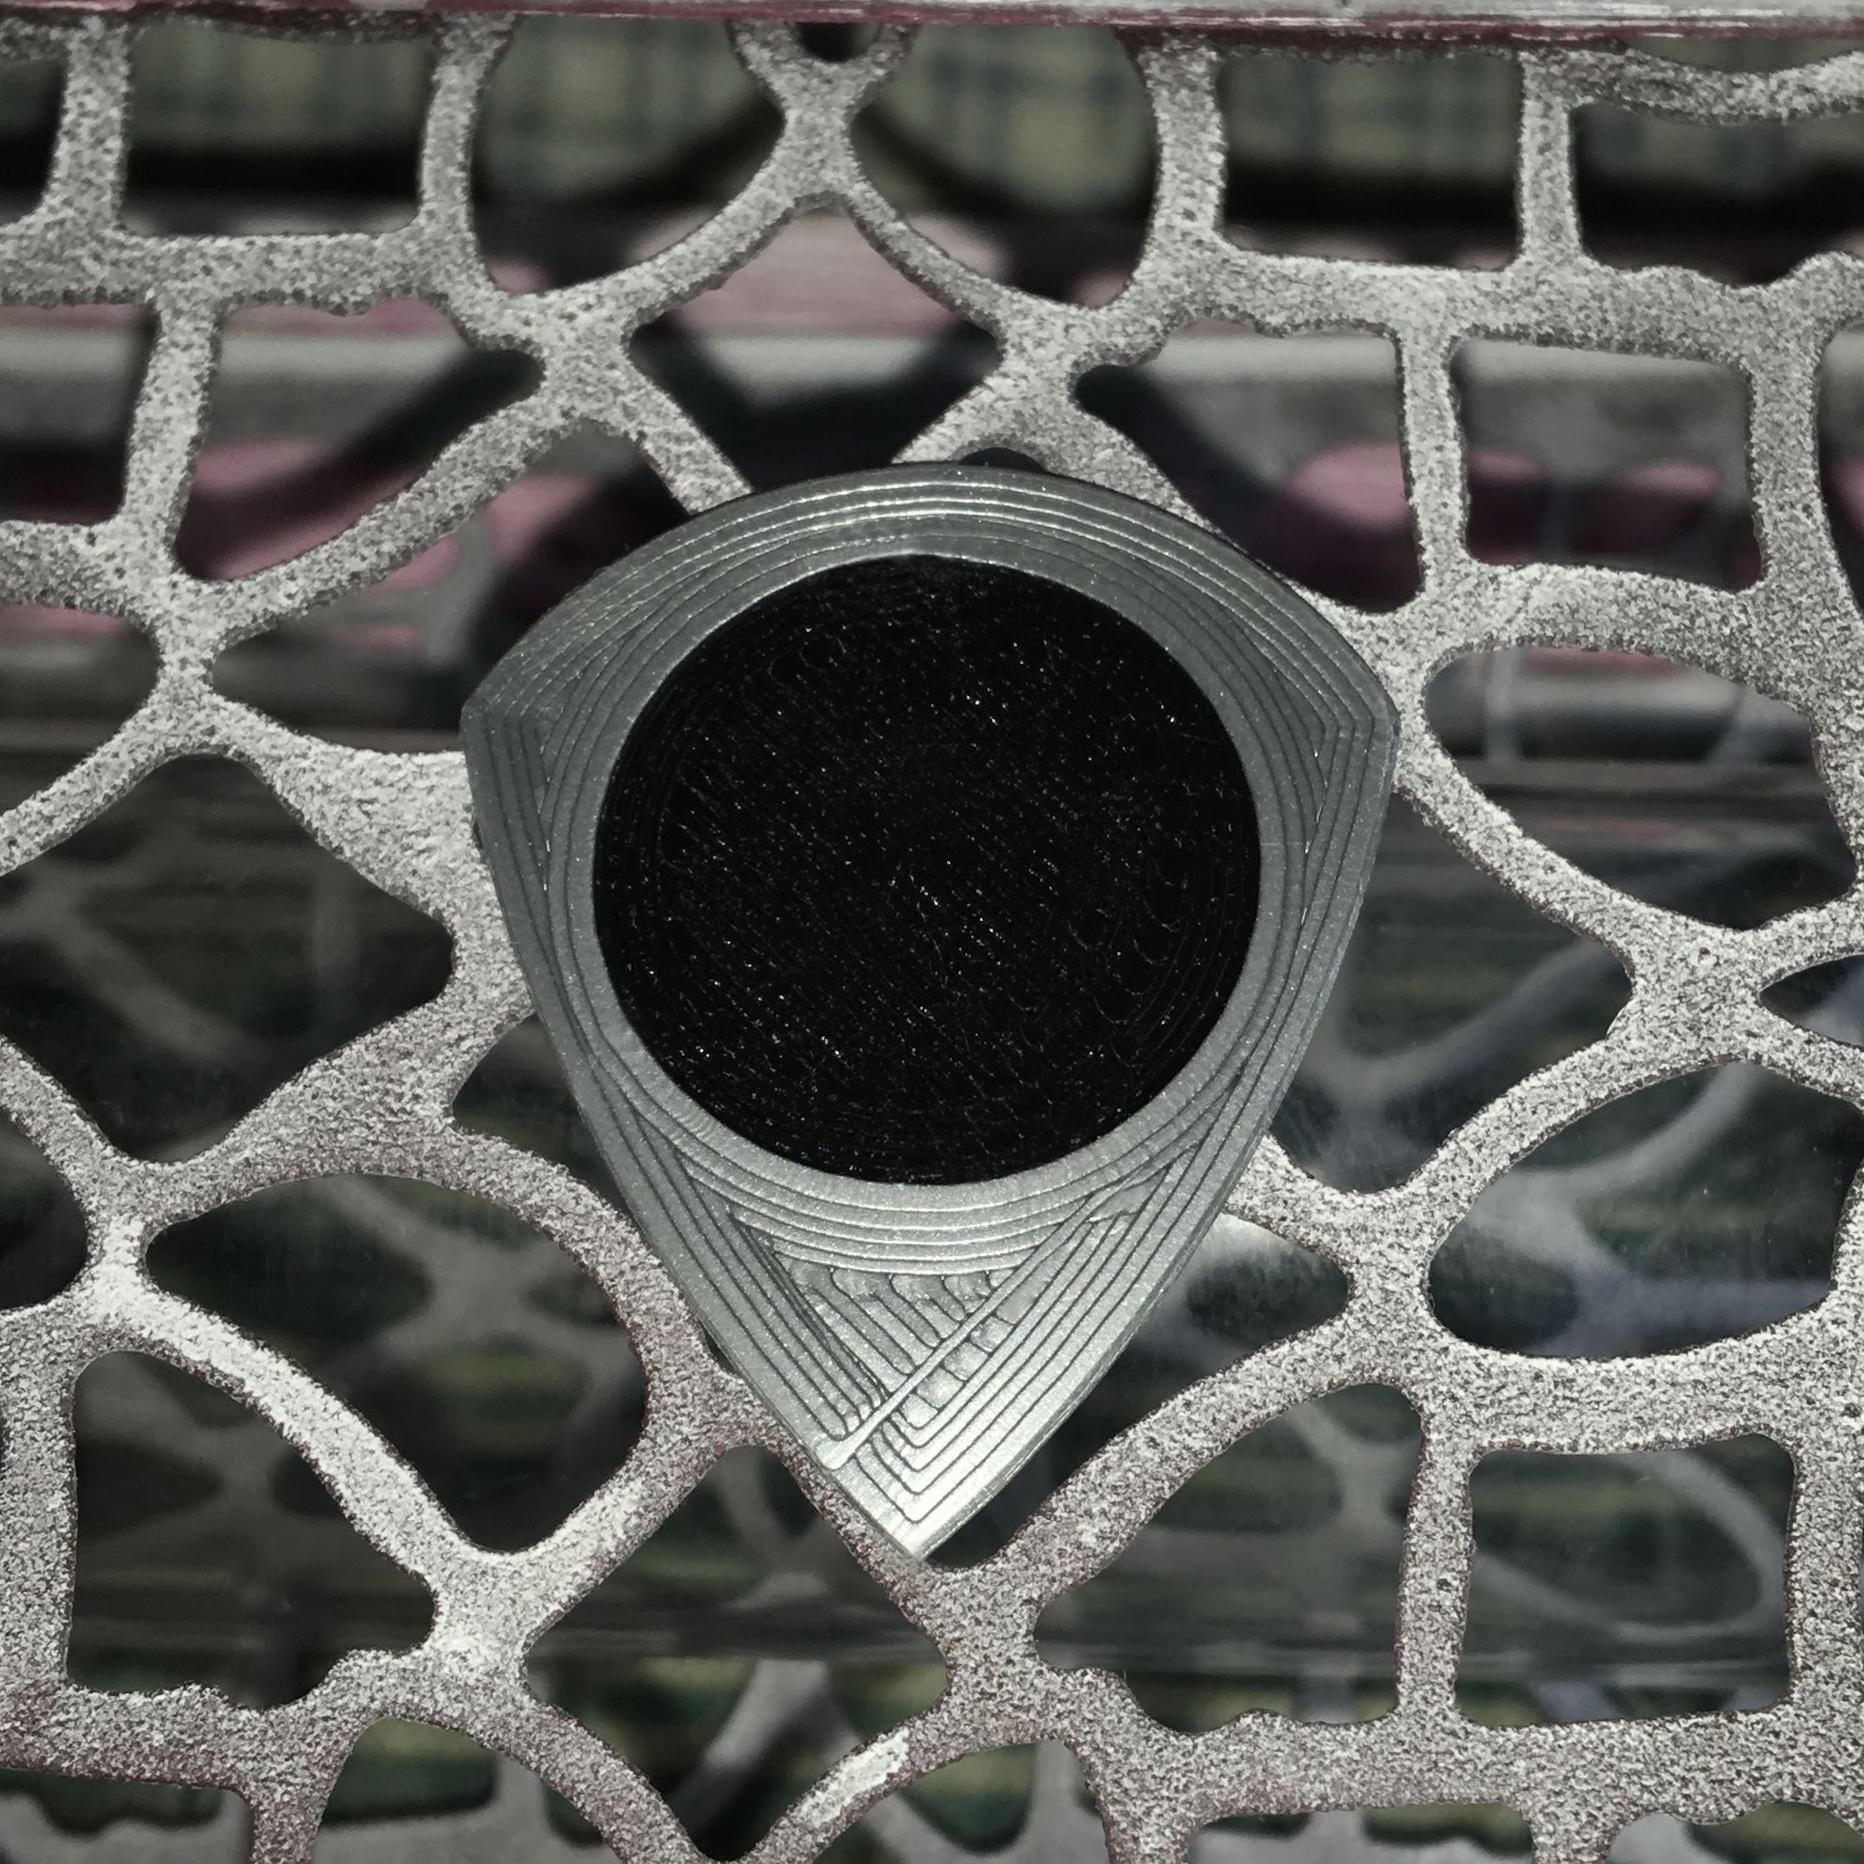 UNU-TRI 210819 26X31 Black.JPG Download free STL file UNU-TRI Pua Nido (Nest Pick Guitar) • 3D printing model, carleslluisar